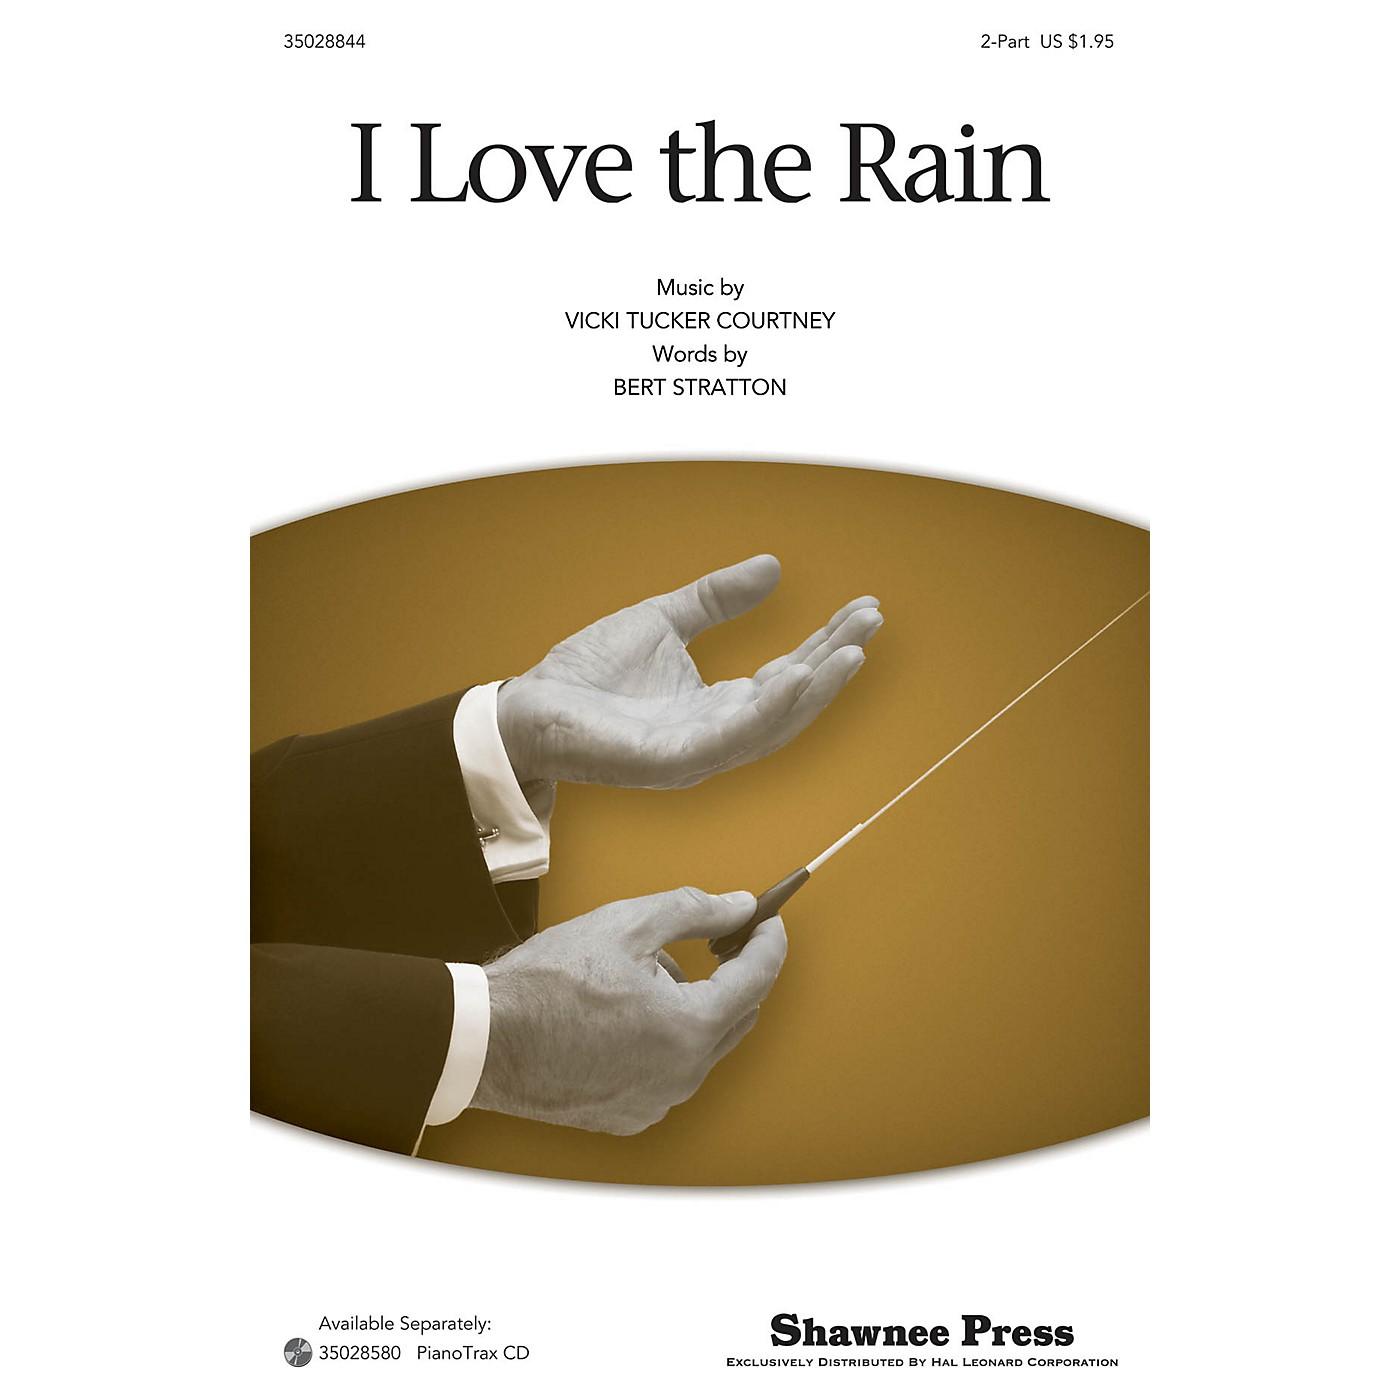 Shawnee Press I Love The Rain 2-Part arranged by Vicki Tucker Courtney thumbnail